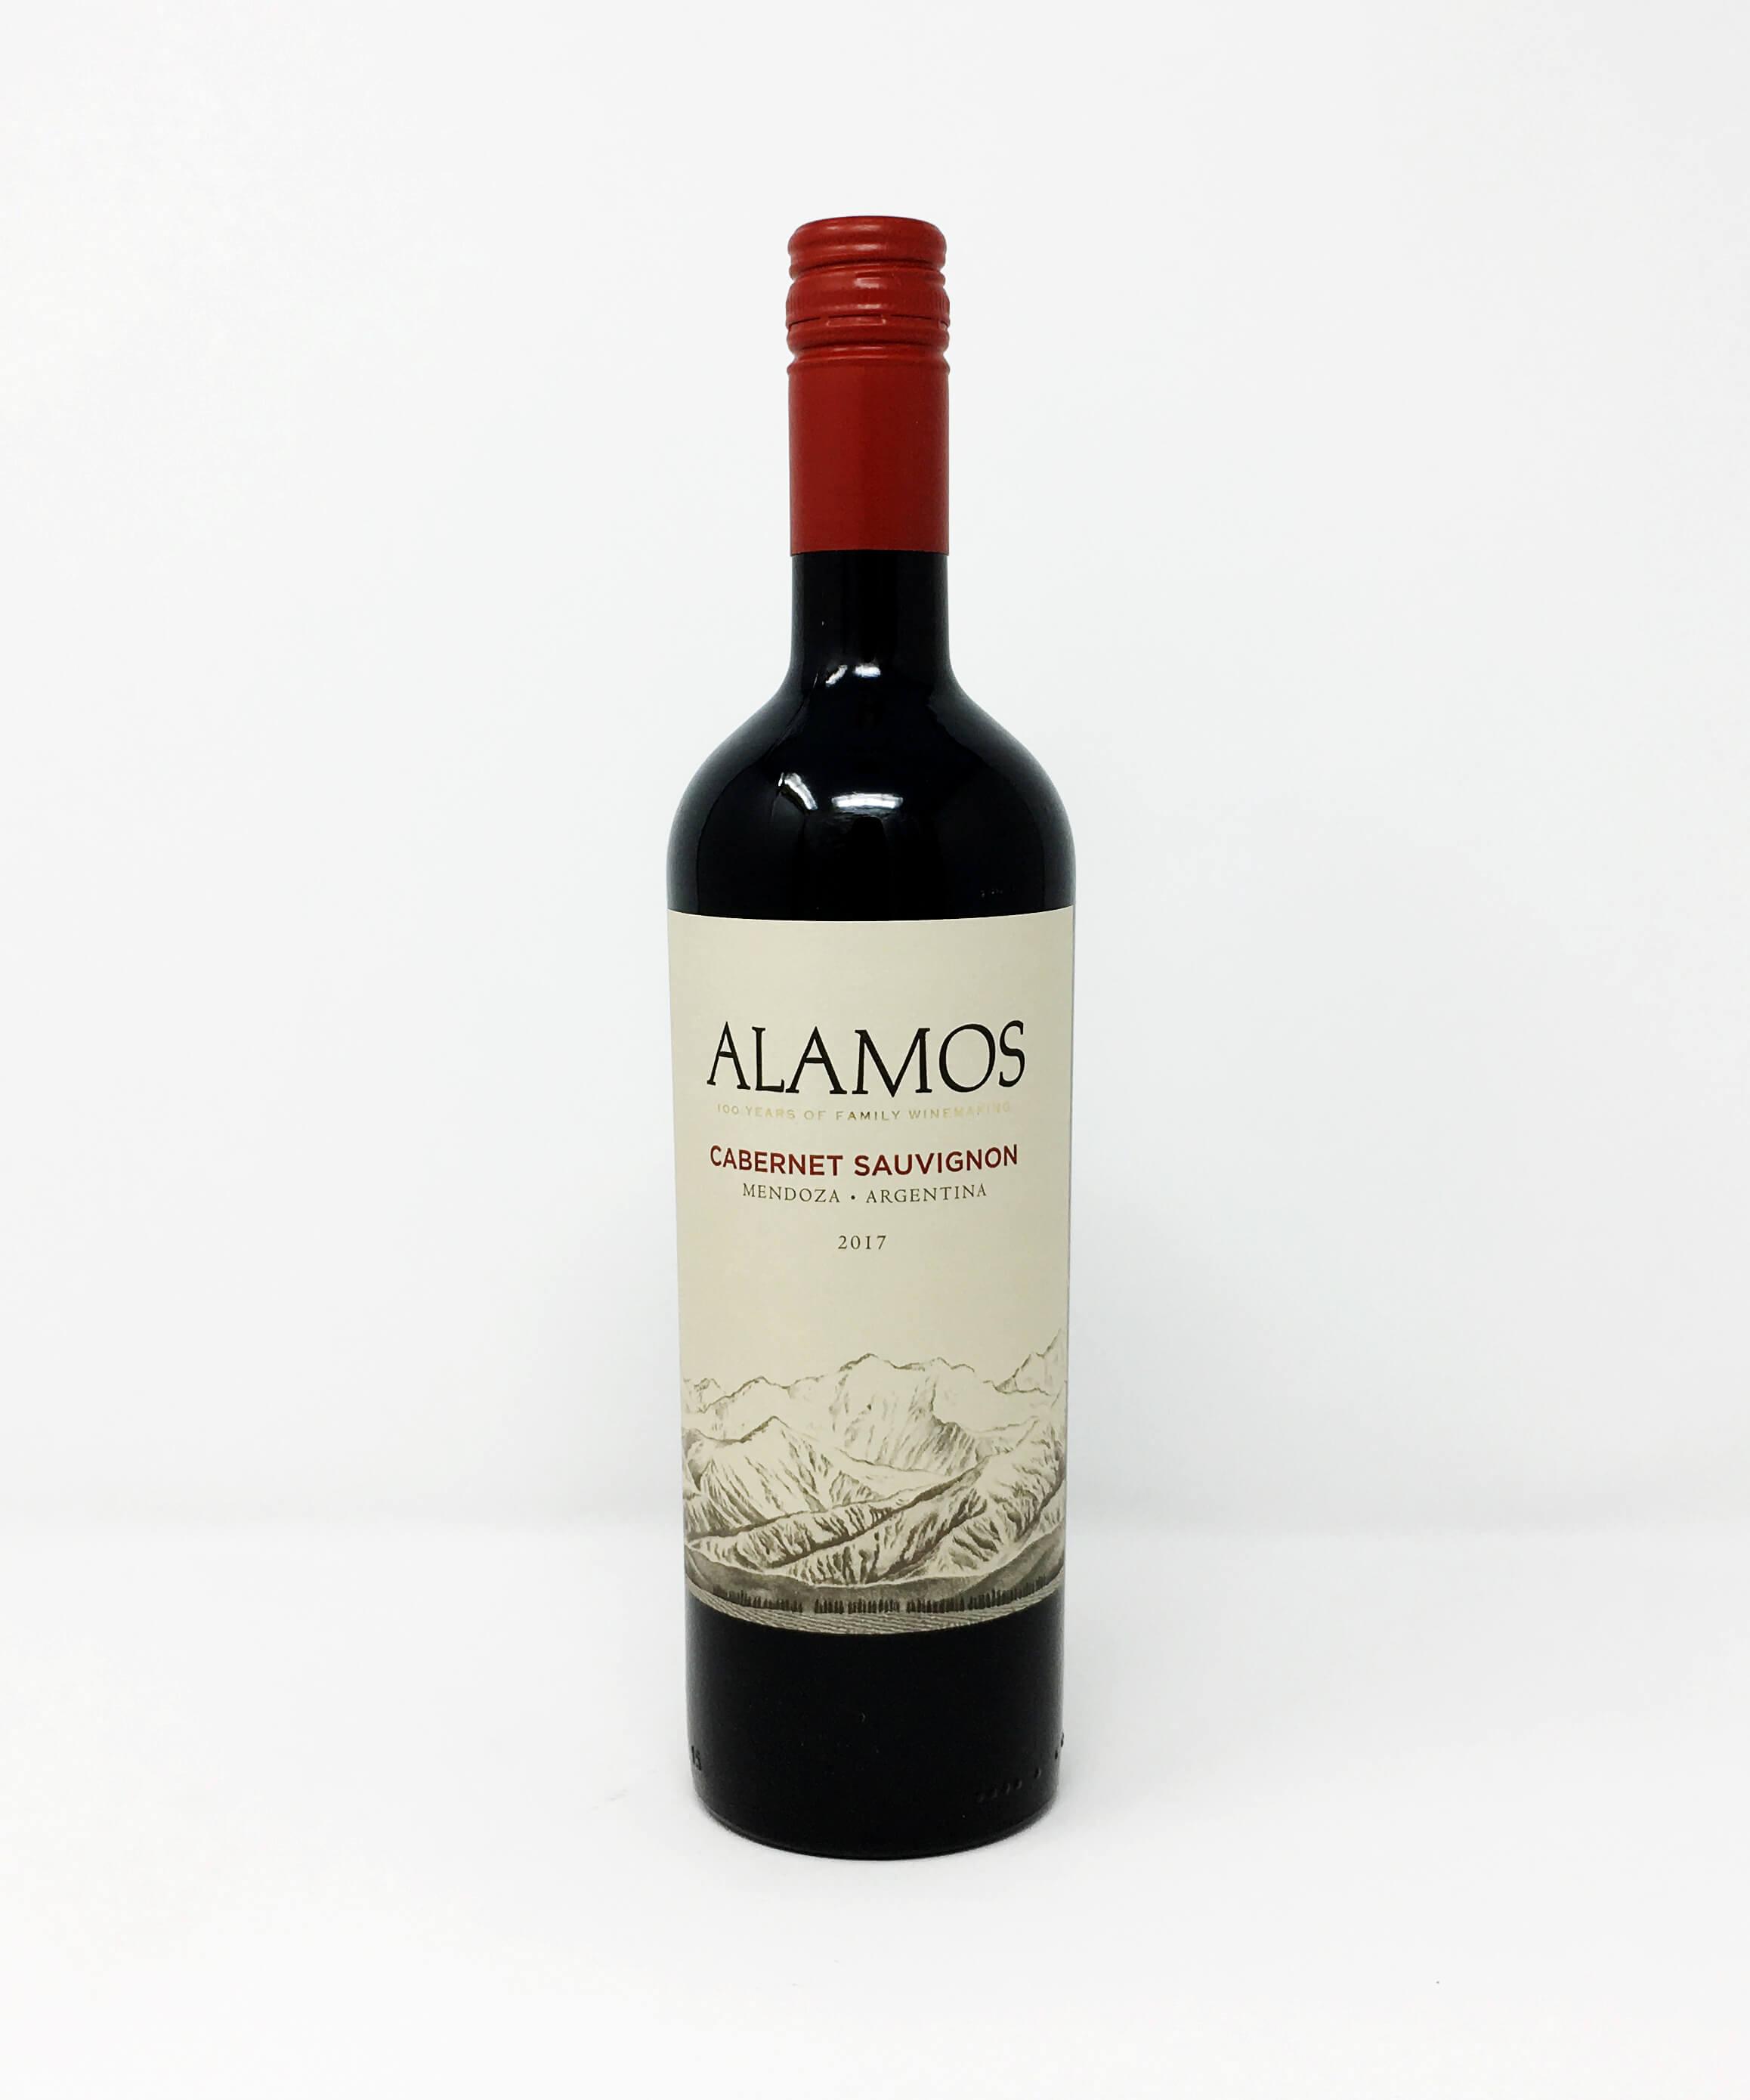 Alamos, Cabernet Sauvignon